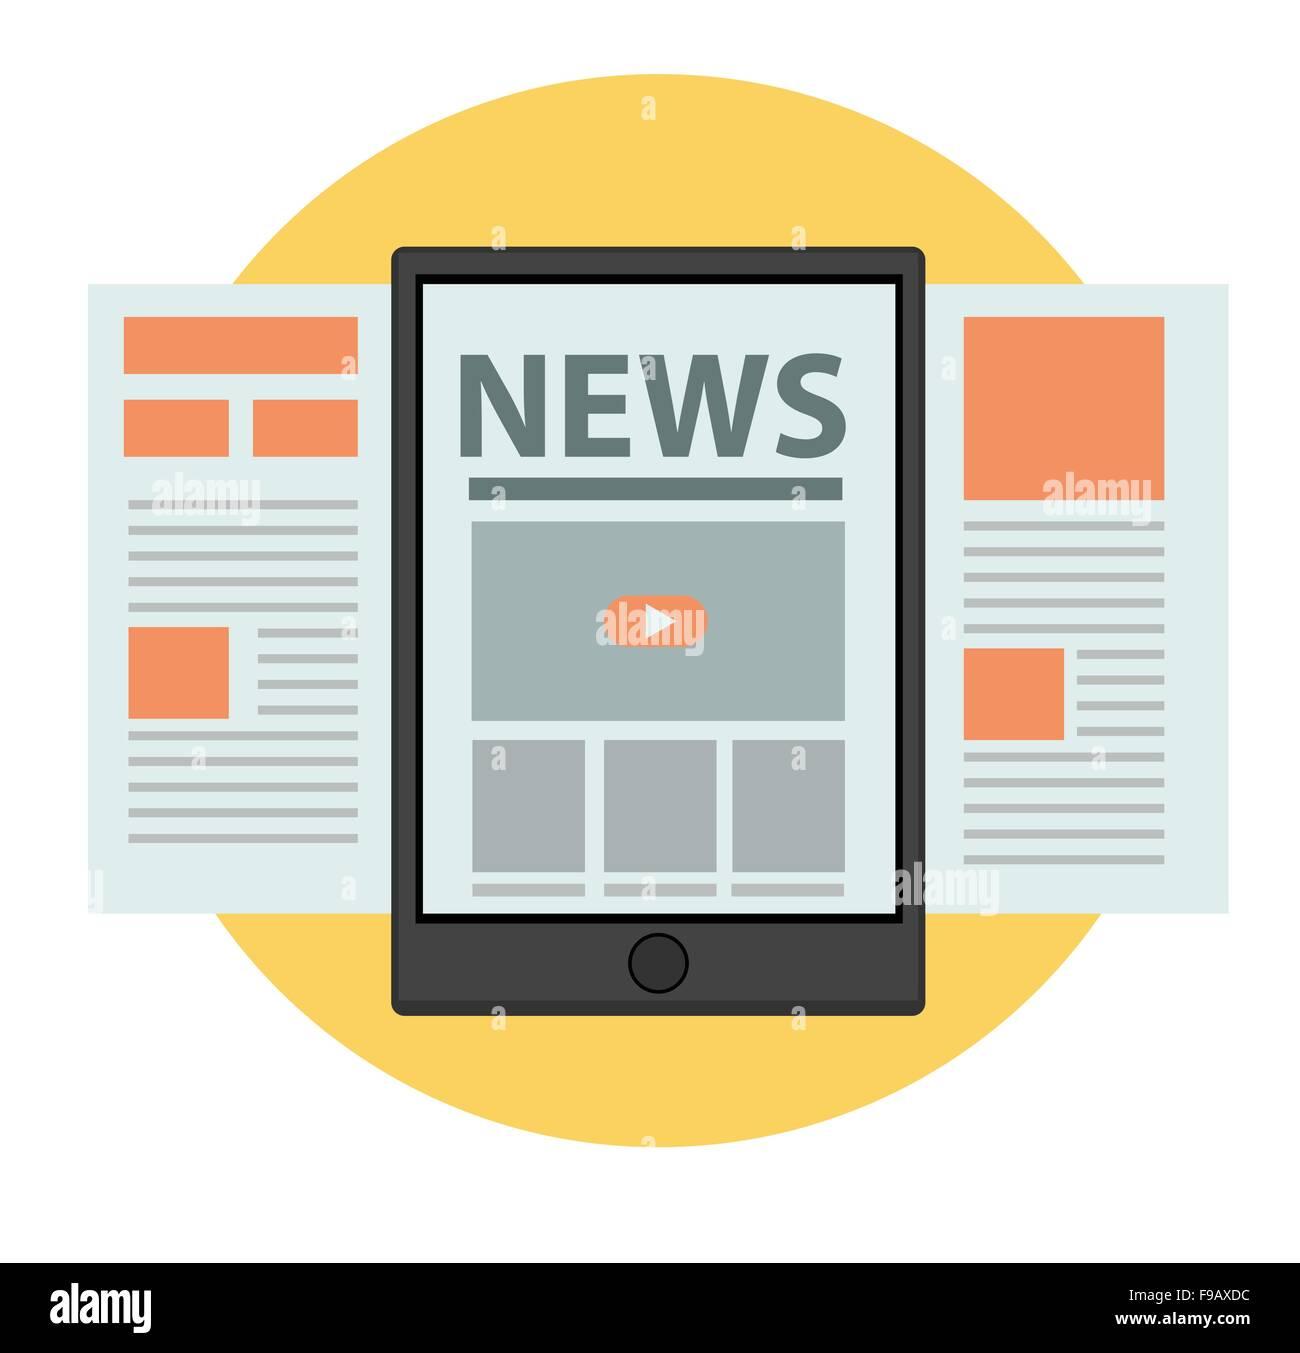 News online Business concept vector design - Stock Image